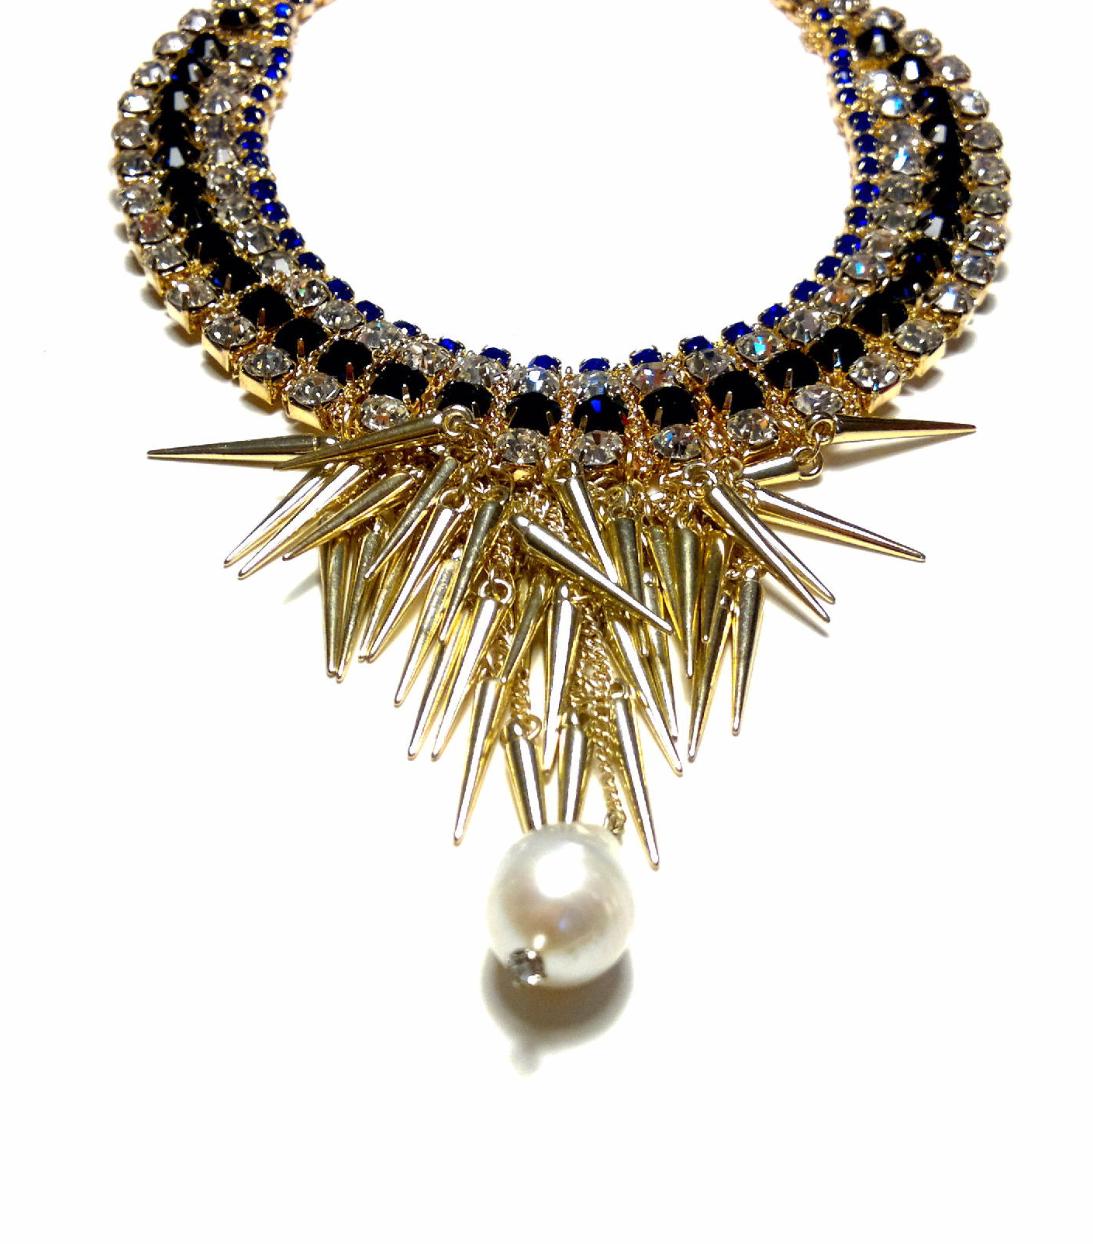 Rhinestone choker with pearl